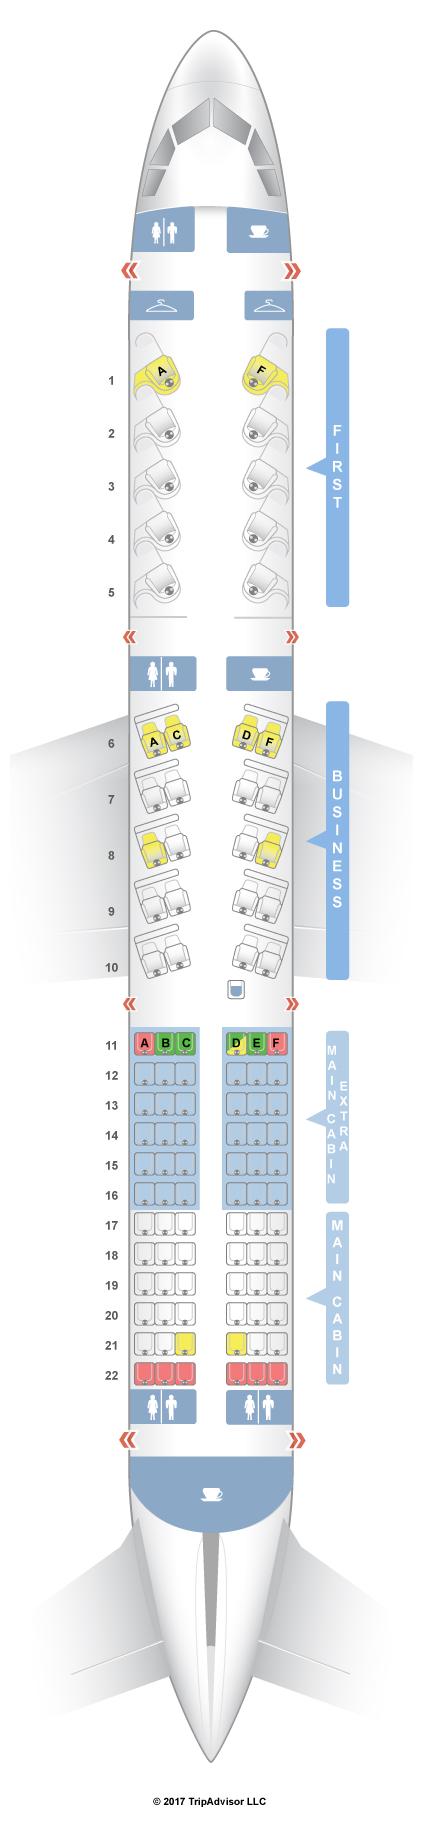 Seatguru Seat Map American Airlines Airbus A321 32b V1